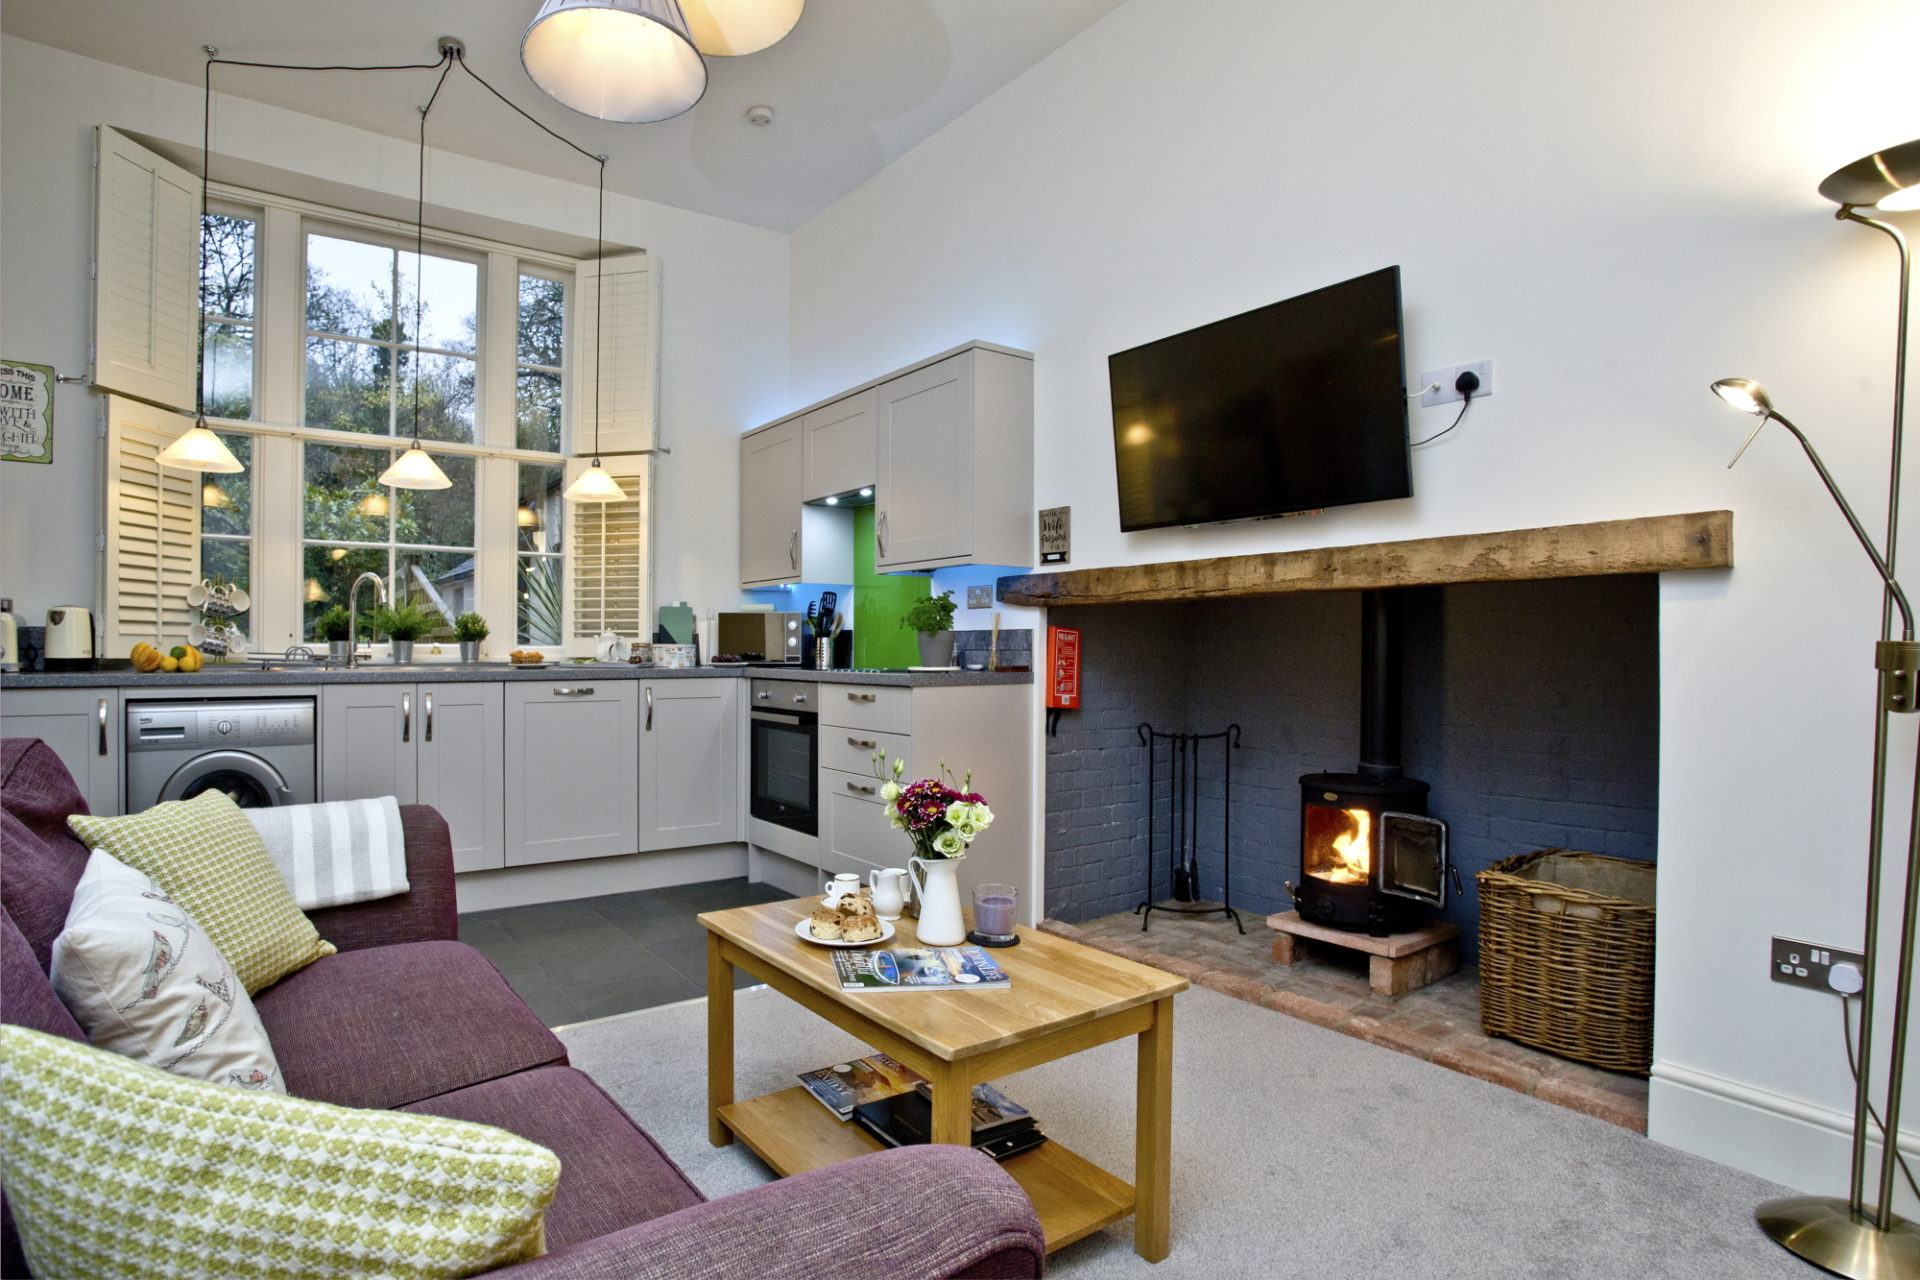 Wisteria cottage- Wood burning stove